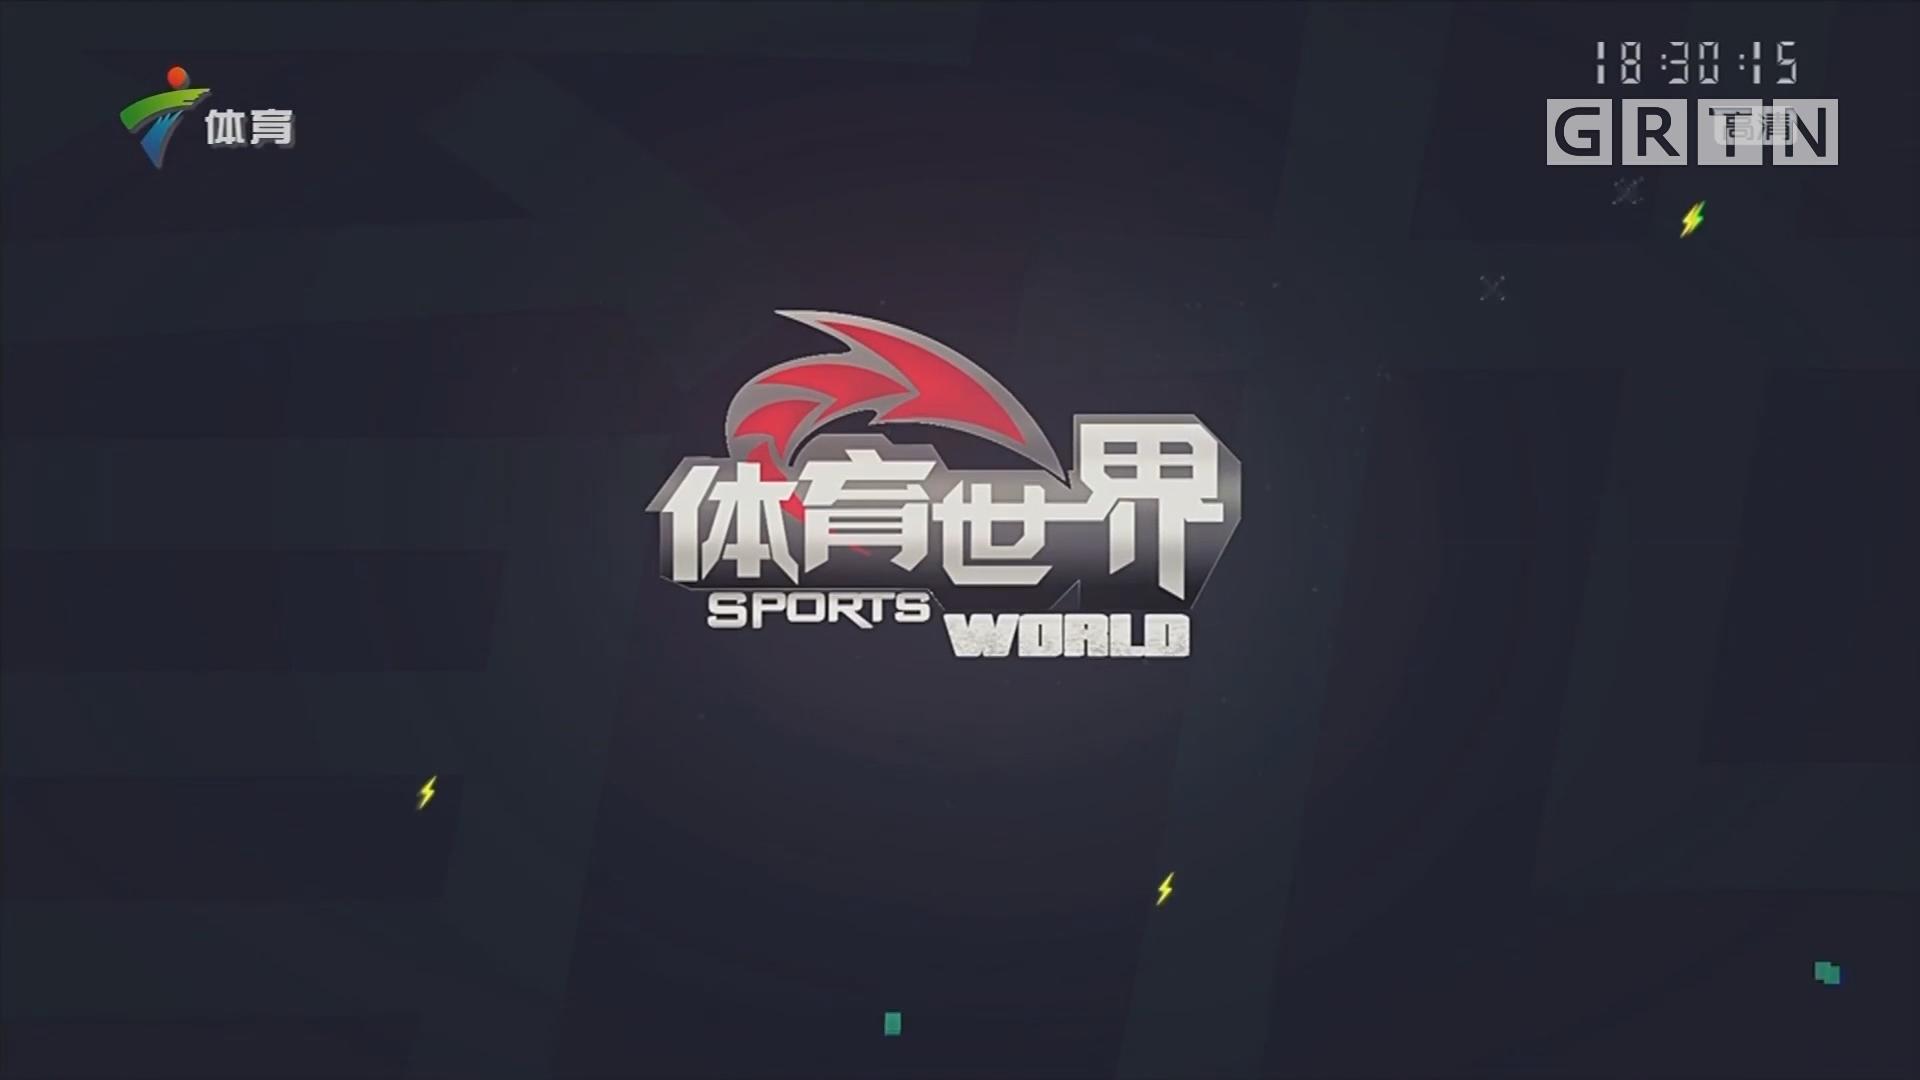 [HD][2018-11-21]体育世界:南粤古驿道定向大赛樟林古港站周末鸣锣